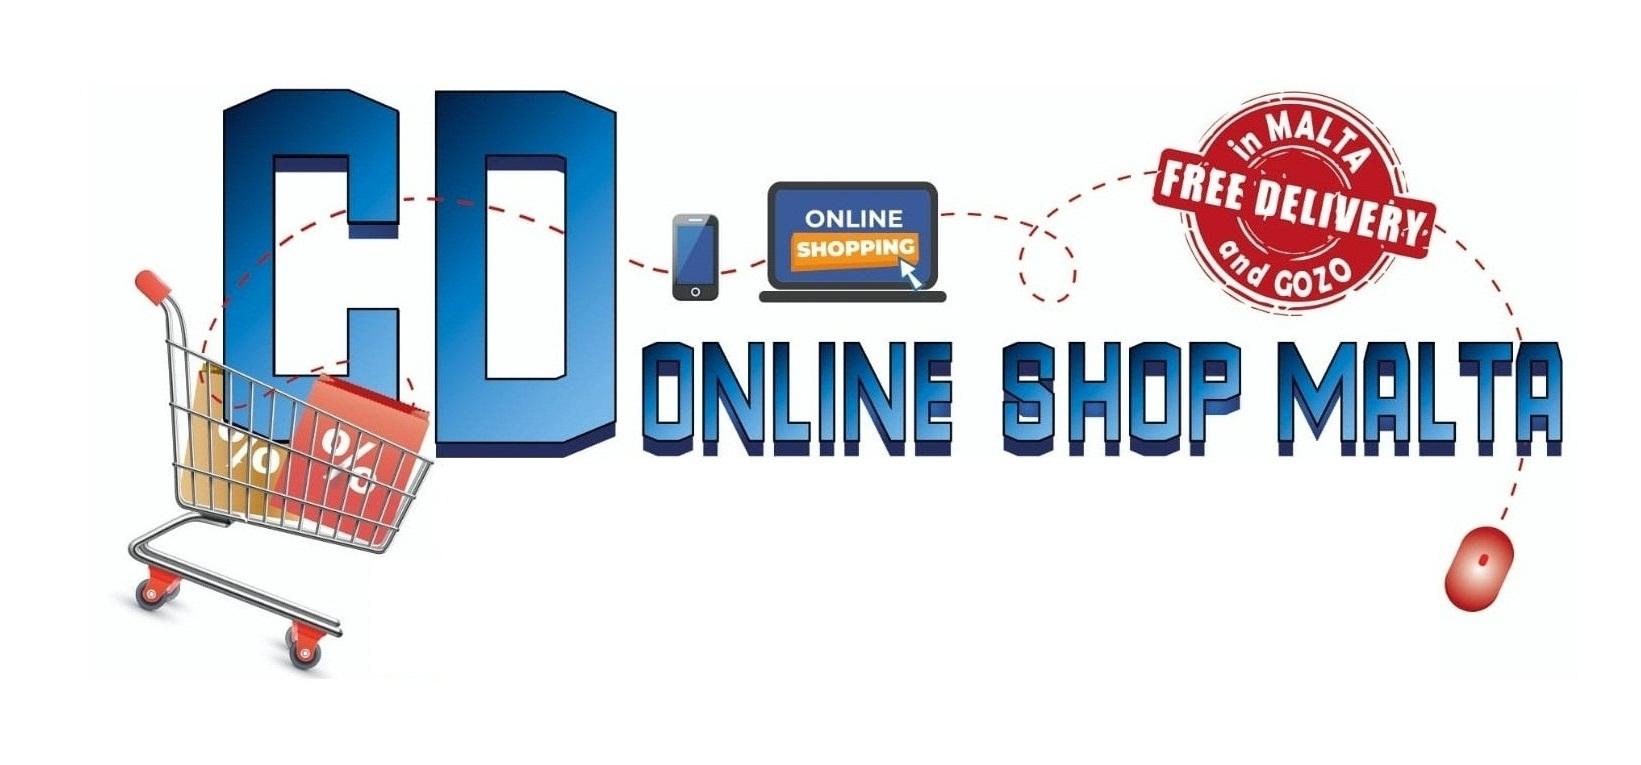 CDOnlineShopMalta-Electronics-HouseholdGoods-Health-BeautyElectrics-Toys-MVM-Malta